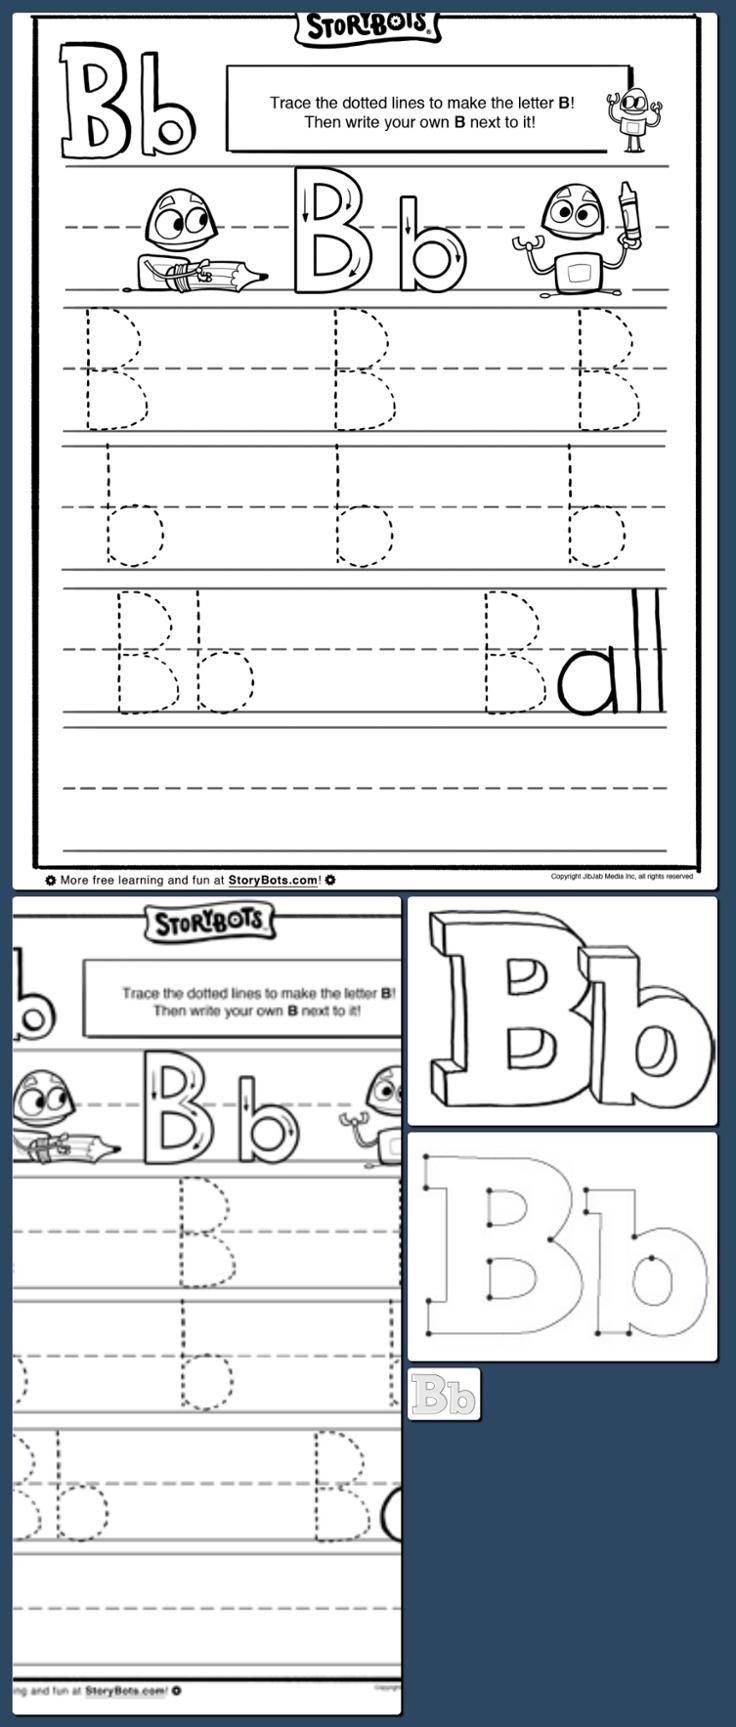 Letter B Tracing Sheet - ABC Activity Sheets - StoryBots http://hoog.